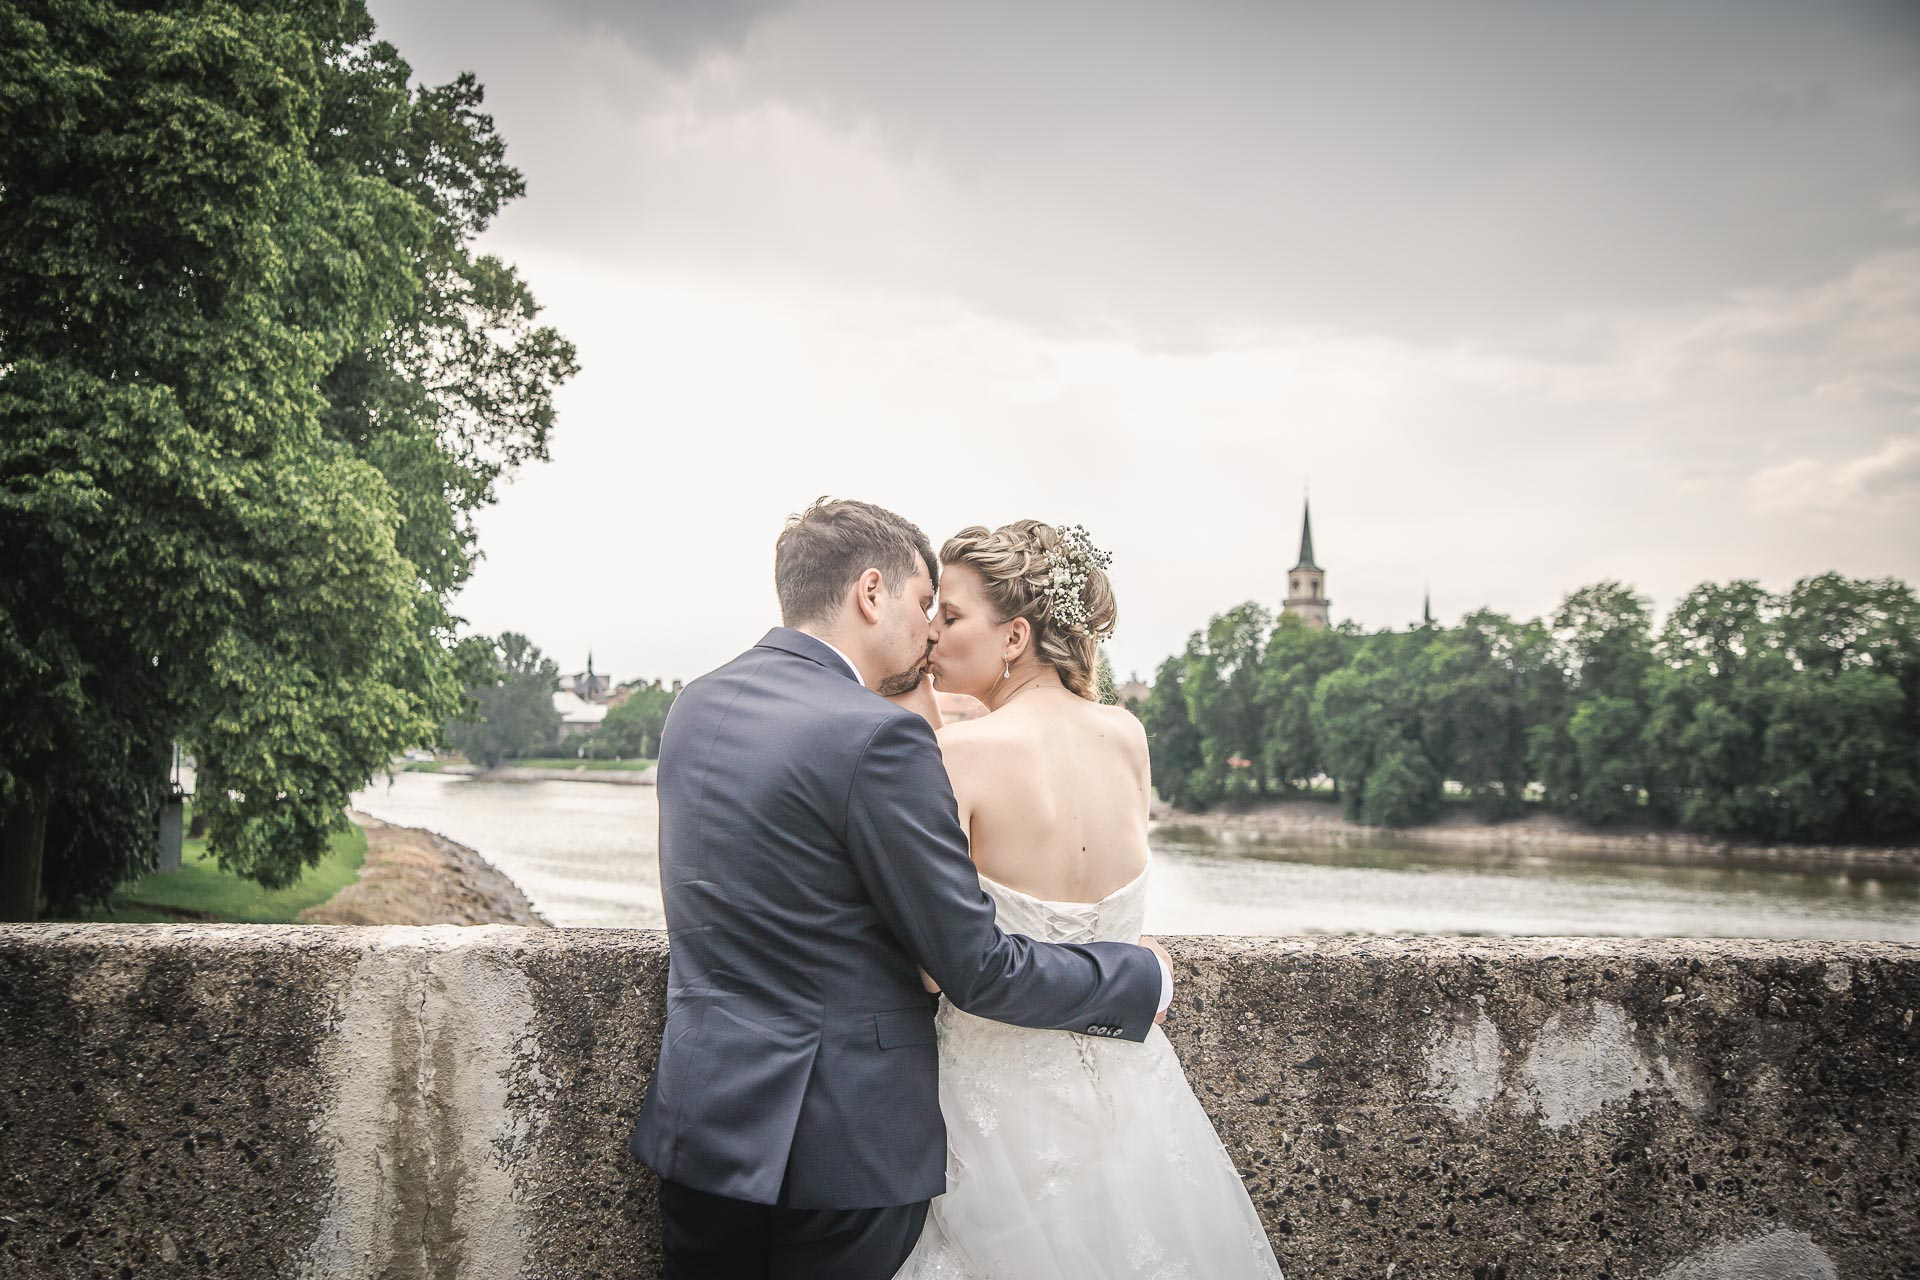 Svatební-fotograf-Nymburk-6133